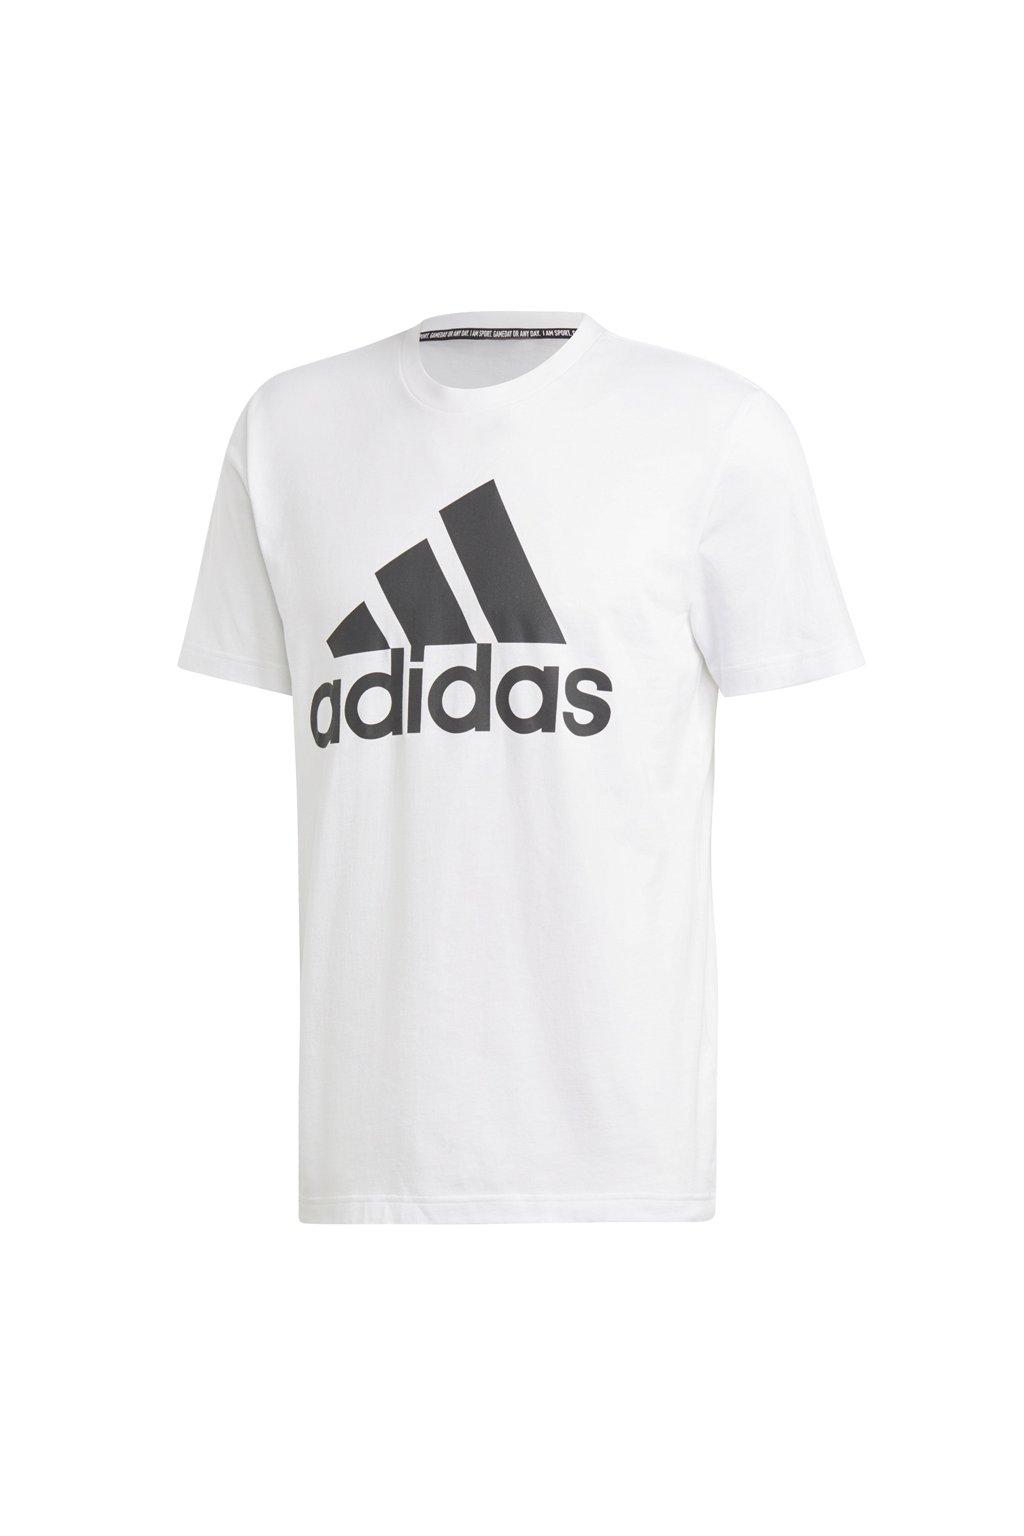 Pánske tričko Adidas MH BOS biele DT9929